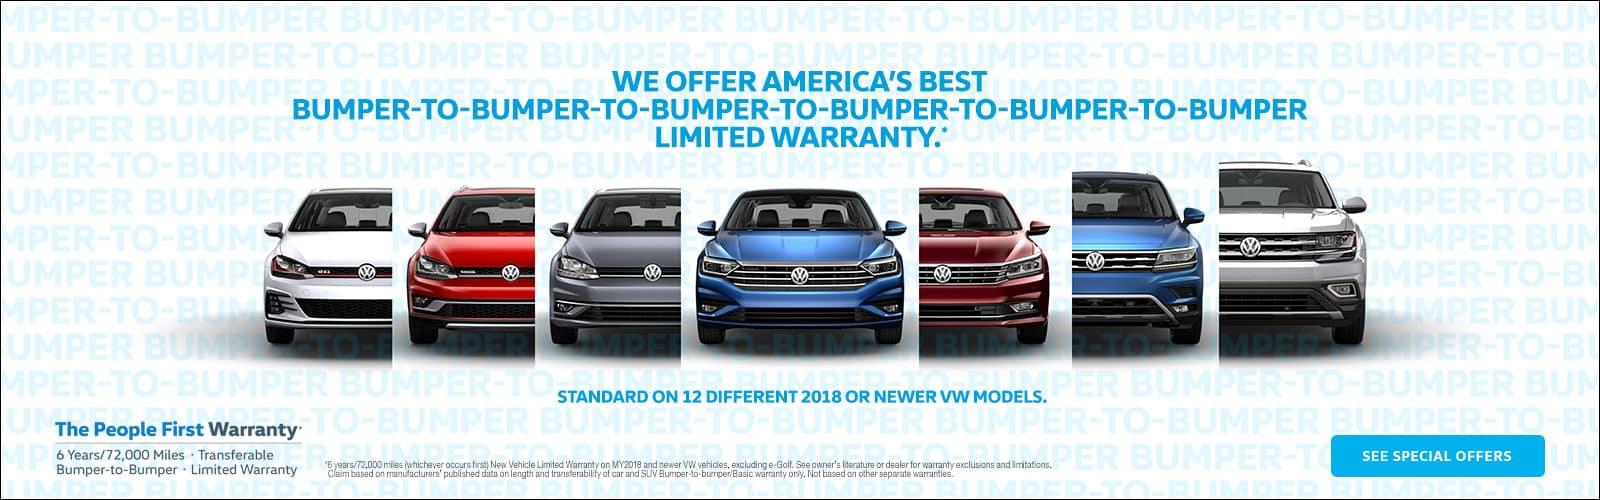 Auburn Volkswagen New Amp Used Cars Auburn Wa